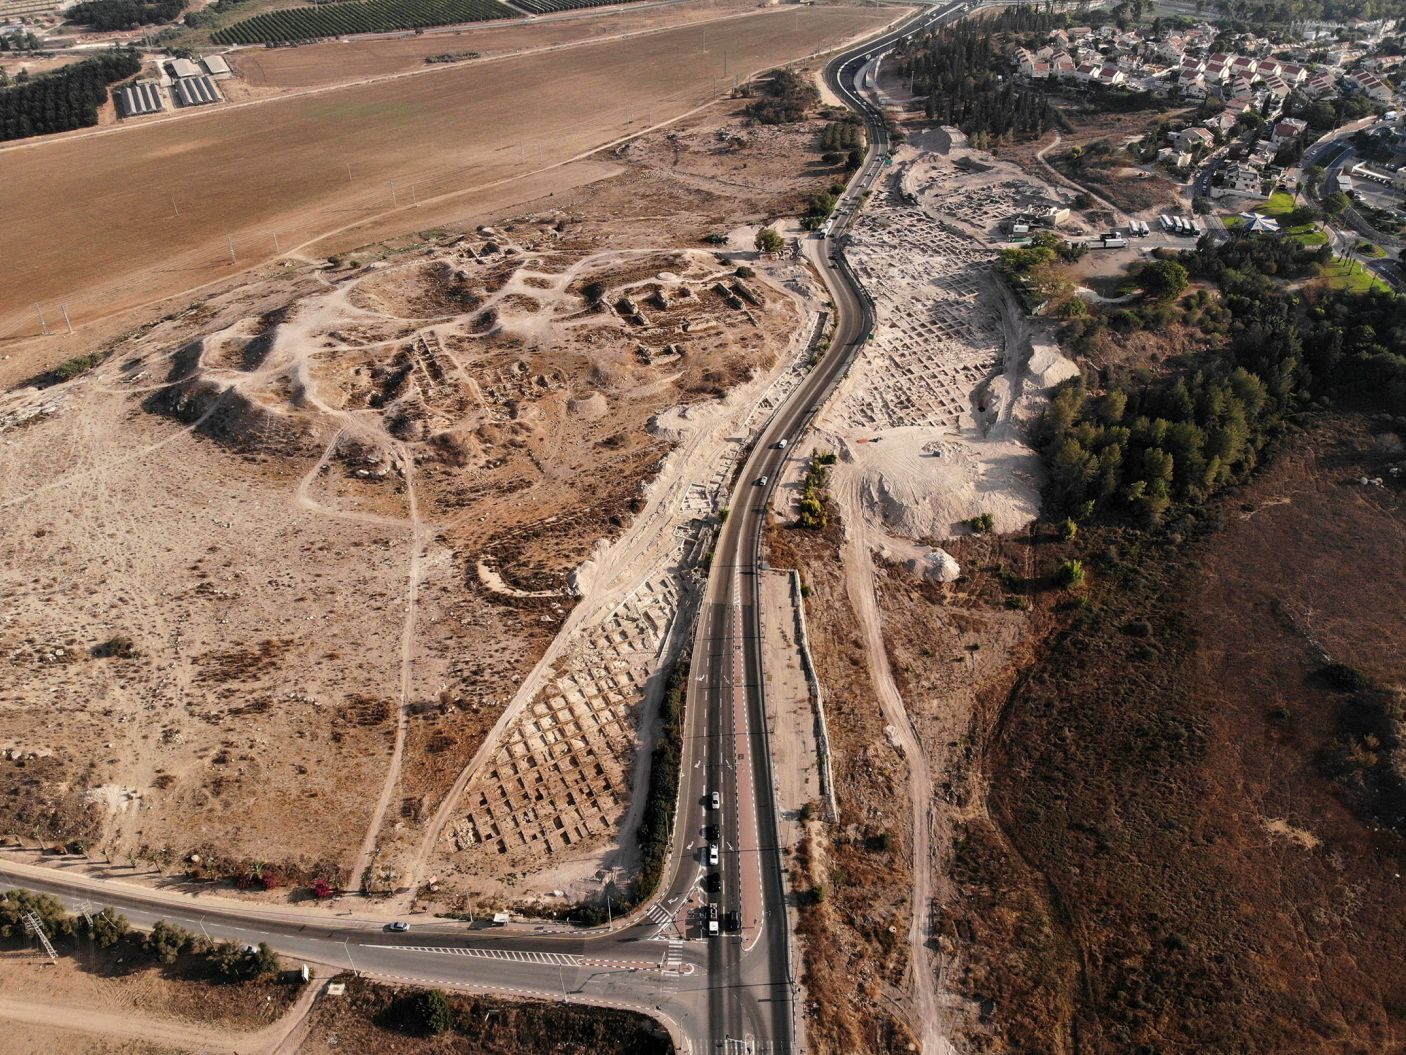 Beth Shemesh Judah: Recent Archaeological Digging At Beth Shemesh (pic Credit